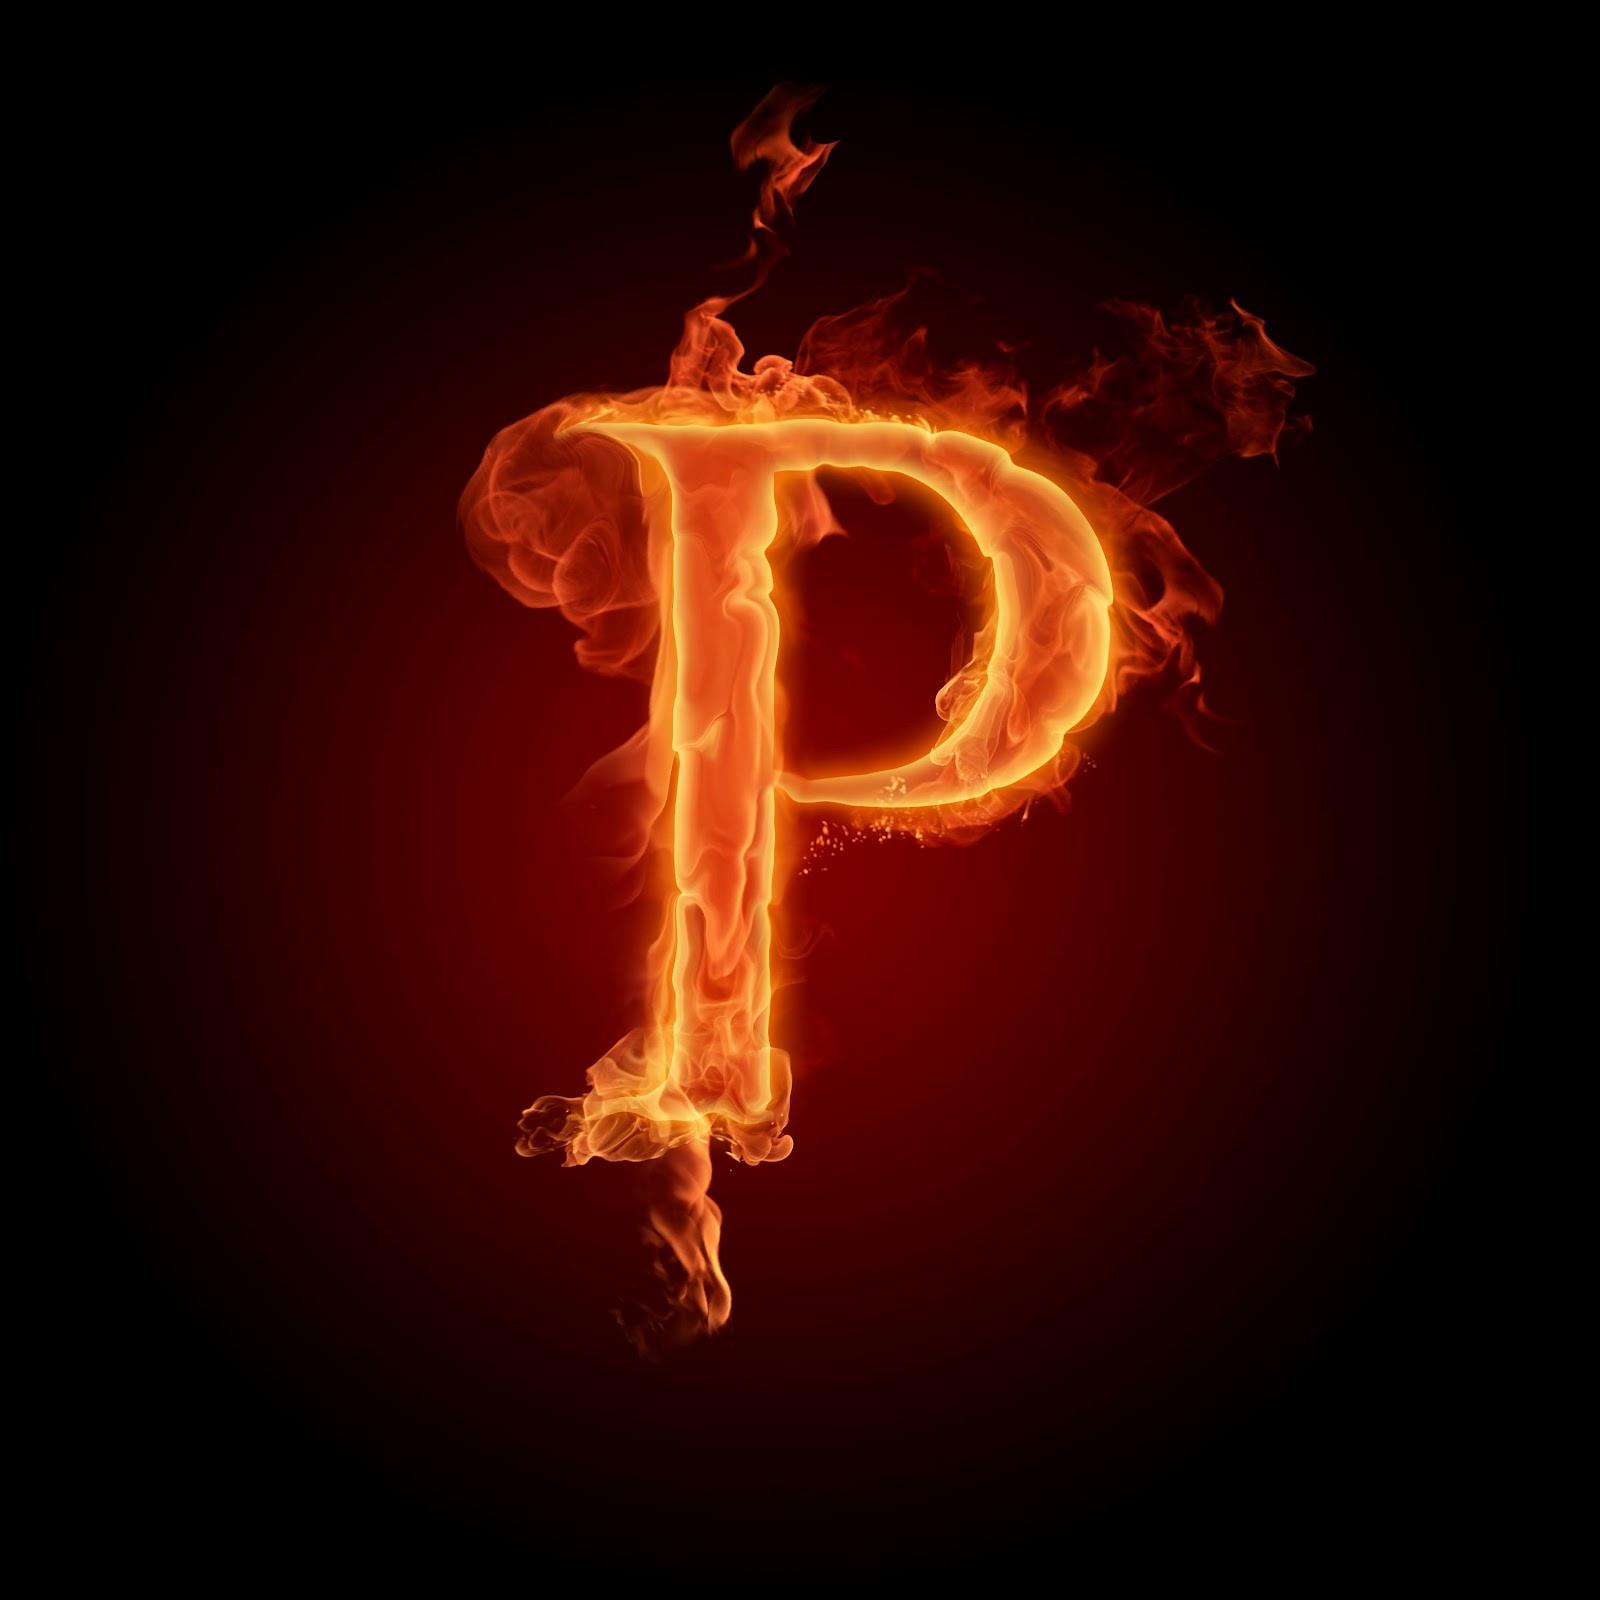 Alphabet Wallpaper In Heart Burning+alphabet+wallpaper+p